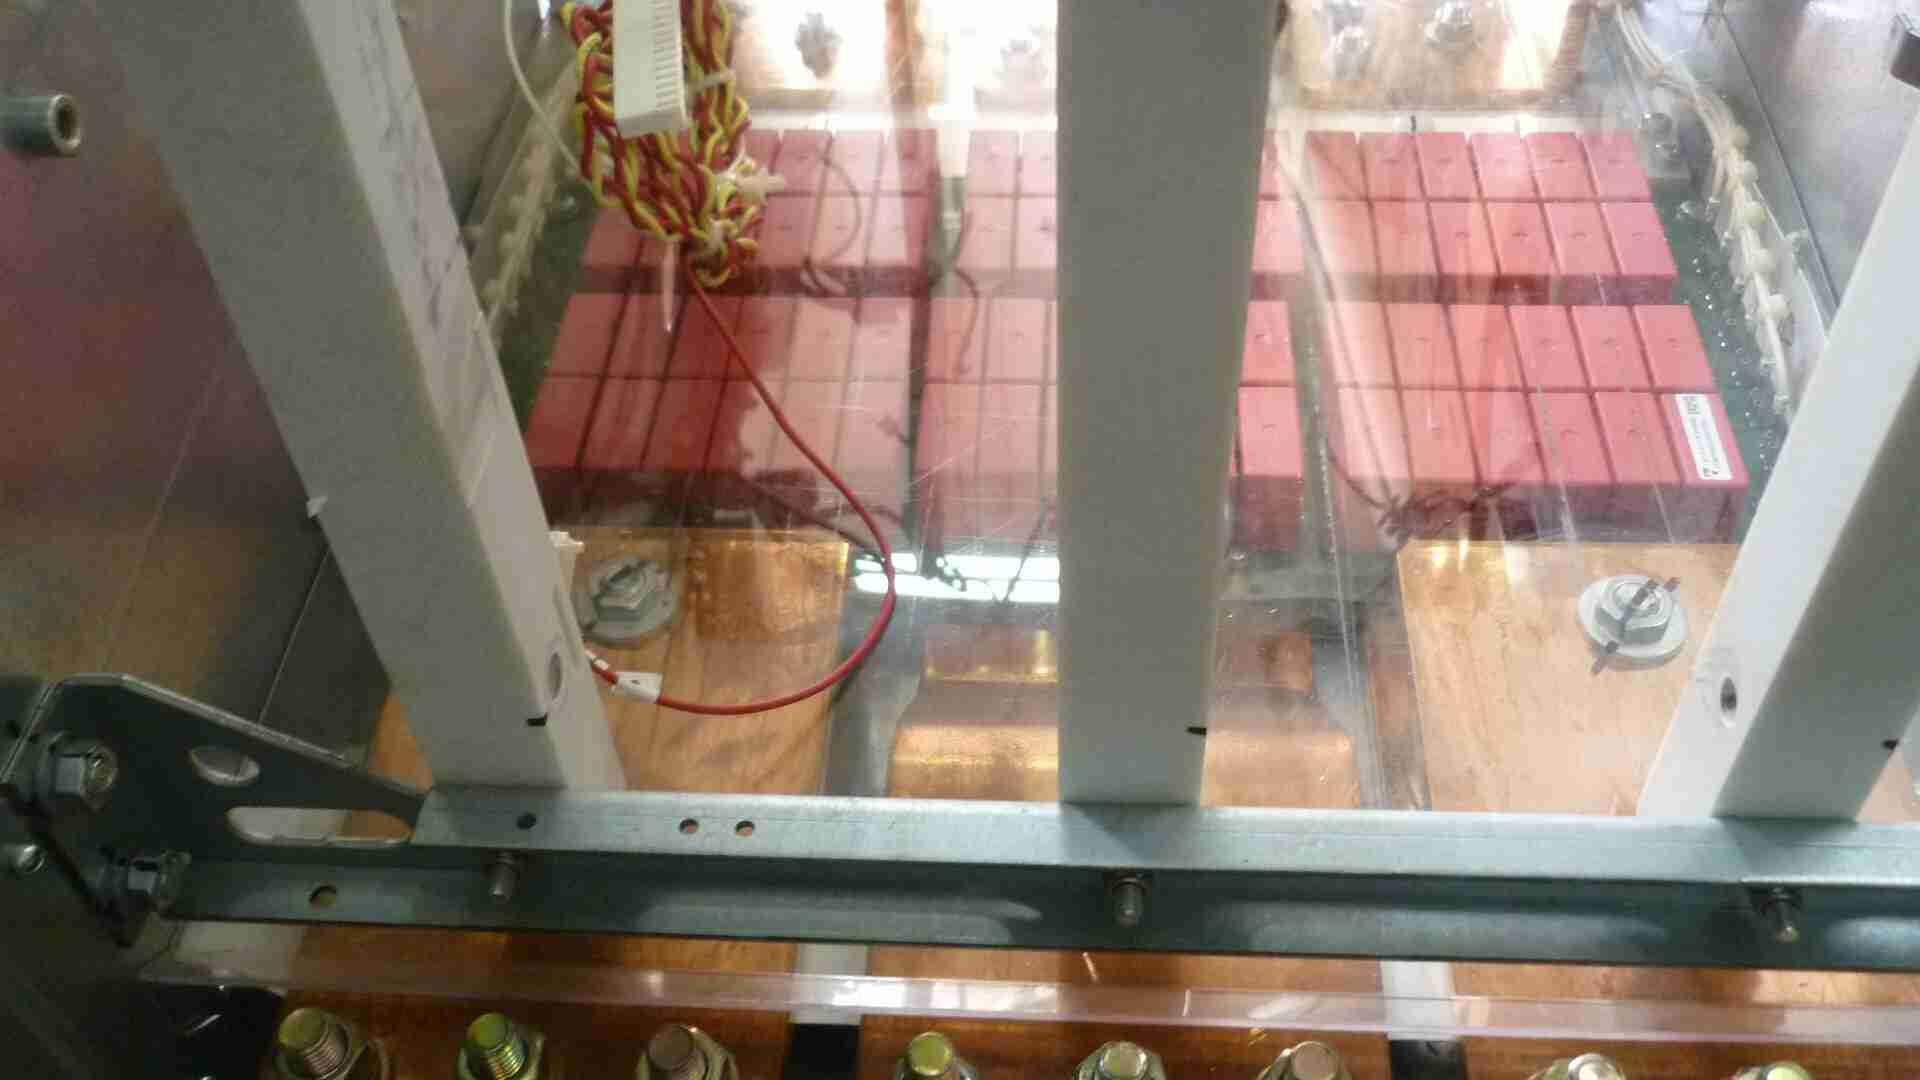 Circuito Rc : Fabricante de circuito rc capitólio